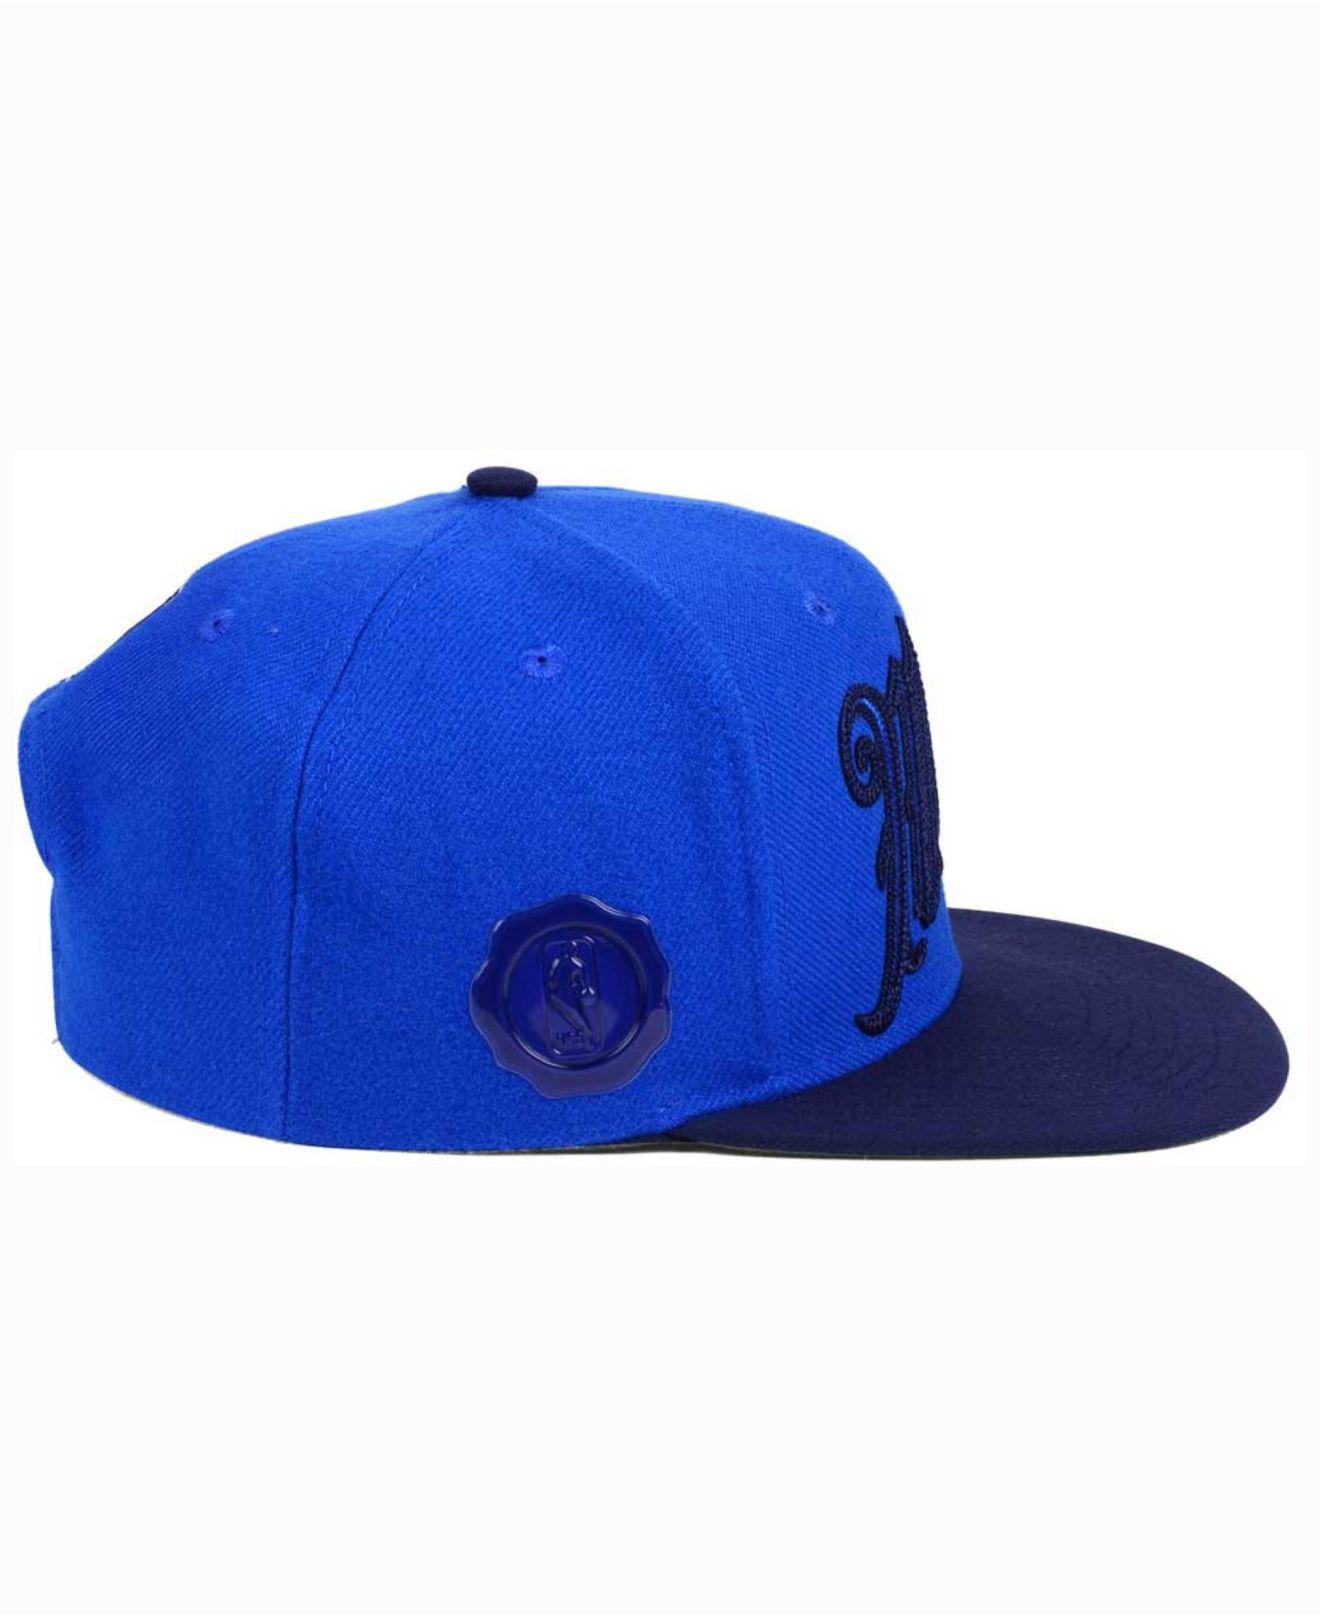 innovative design 7f341 7391f Lyst - adidas Seasons Greeting Snapback Cap in Blue for Men